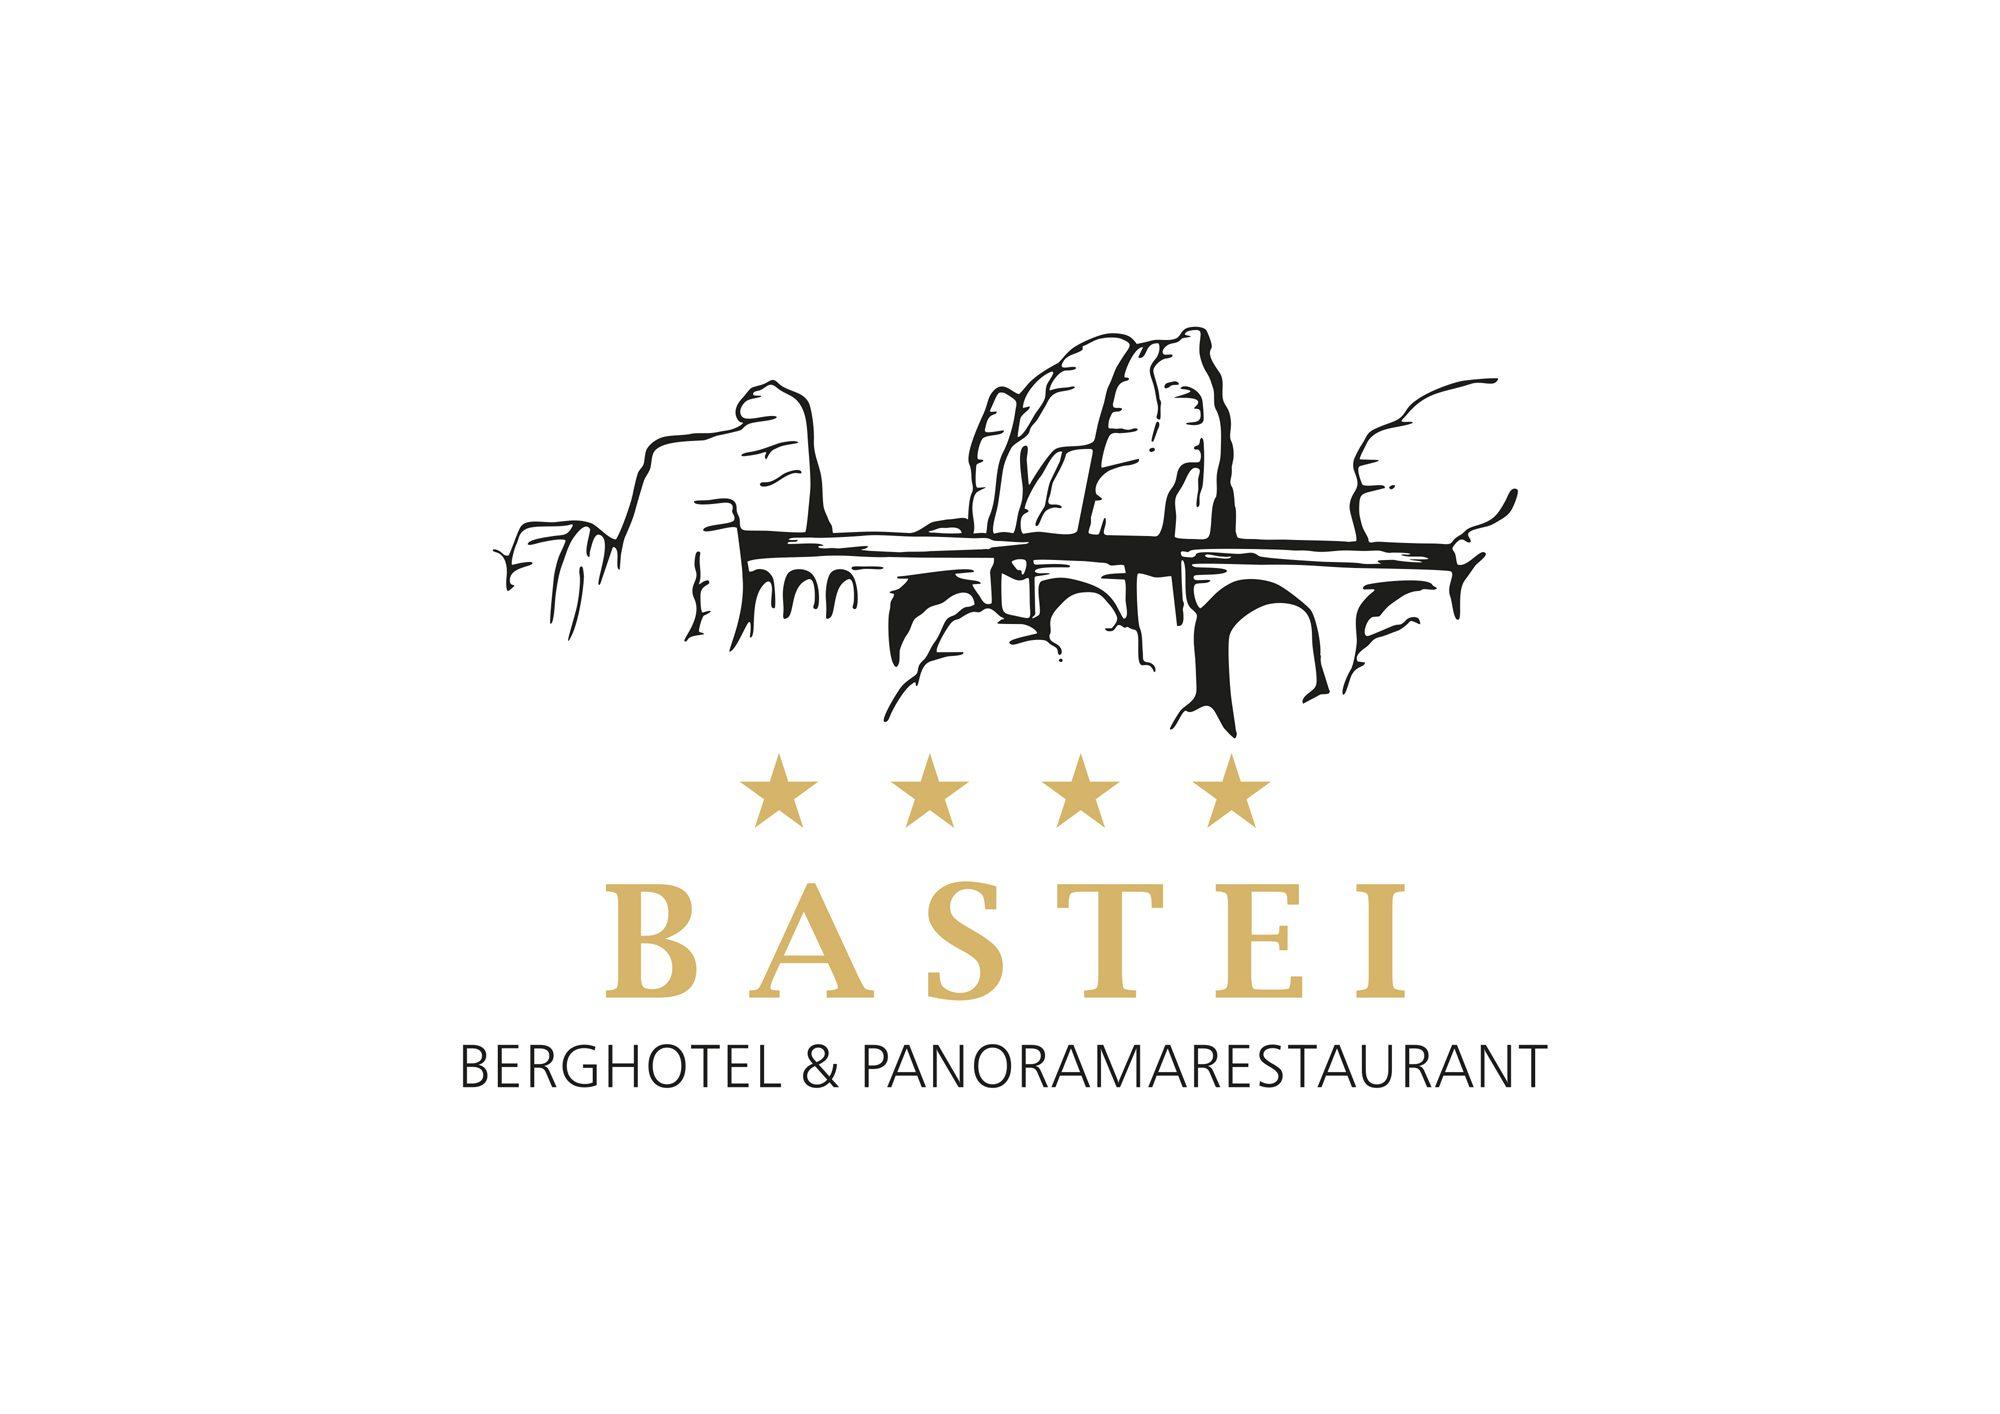 Berghotel Bastei Logo